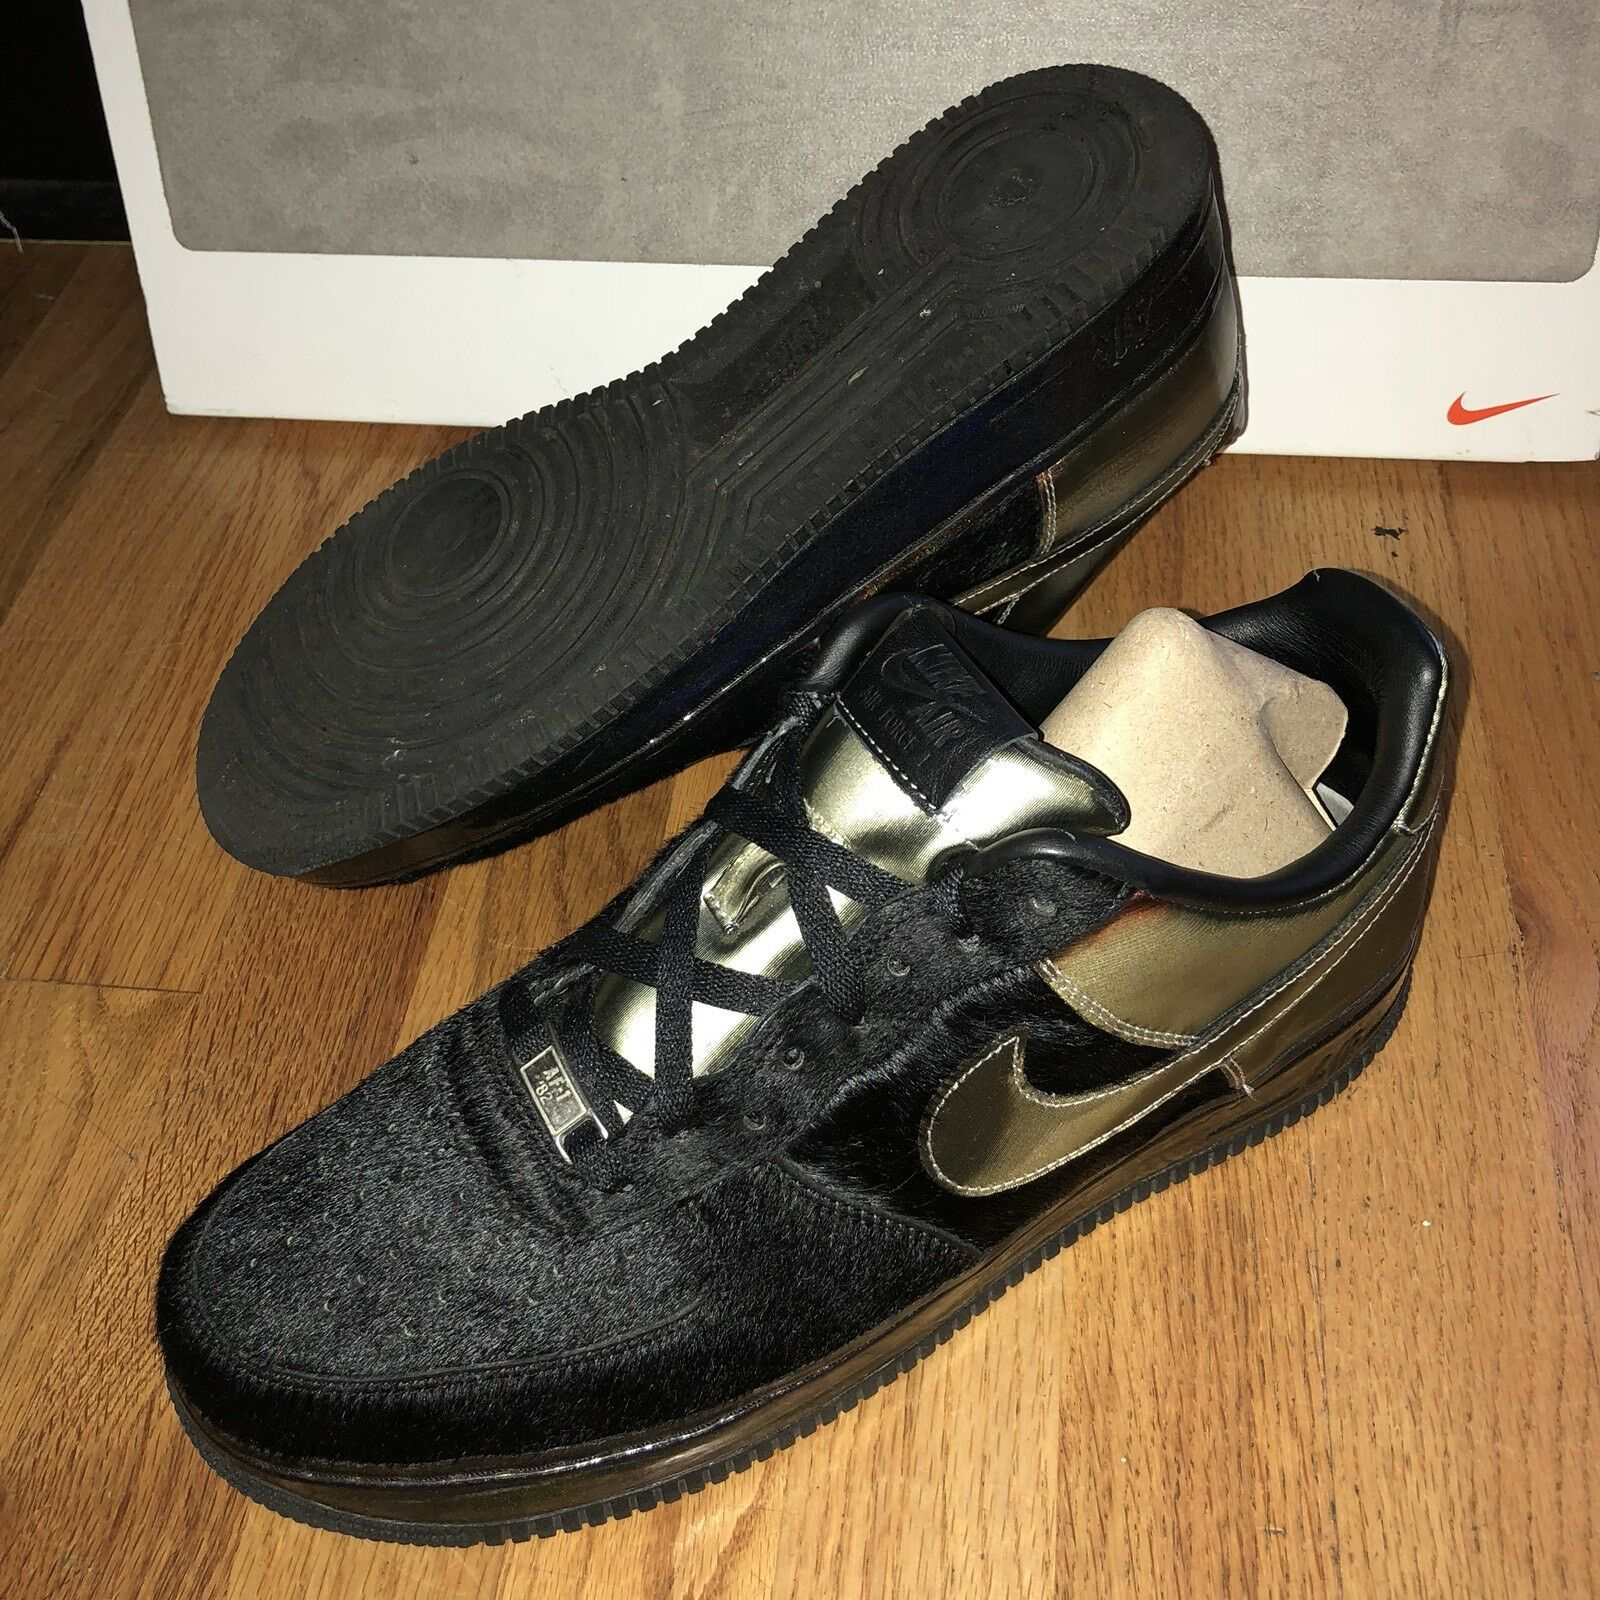 Nike Air Force 1 Low Supreme DJ Clark Kent Black Friday Men's Sz 11 Black Gold